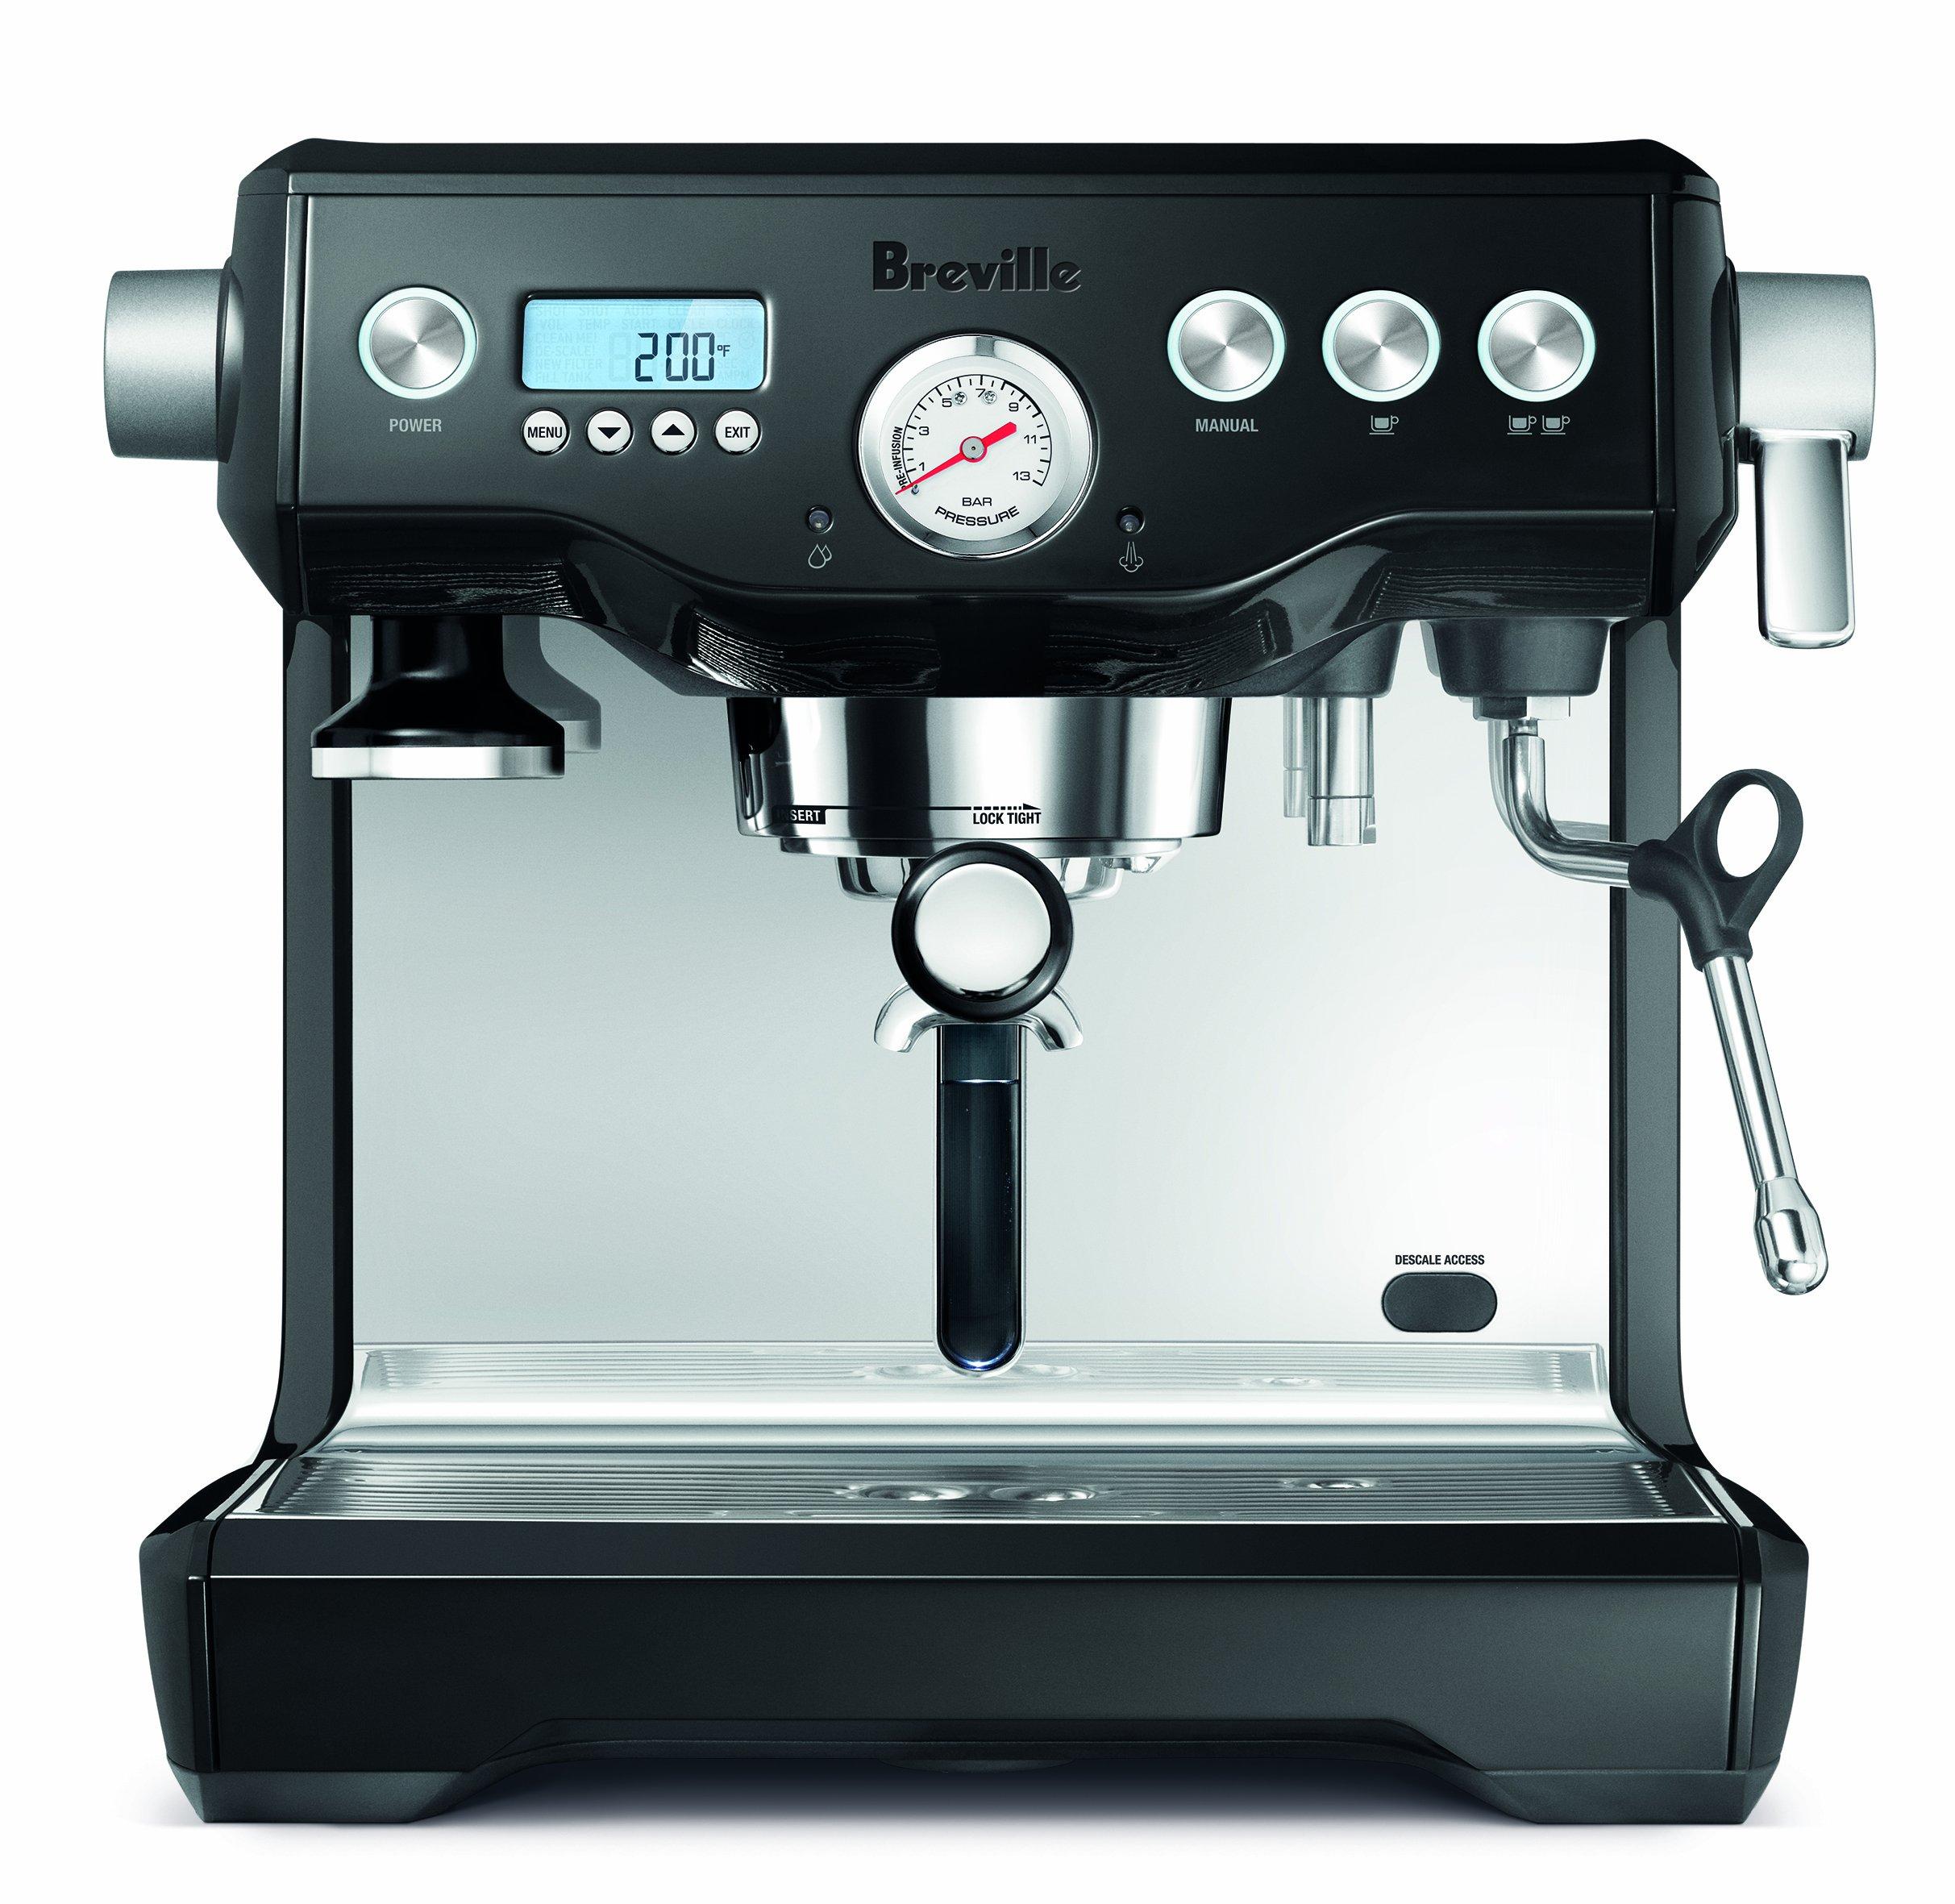 Cheap Brass Boiler Espresso Machine, find Brass Boiler Espresso ...